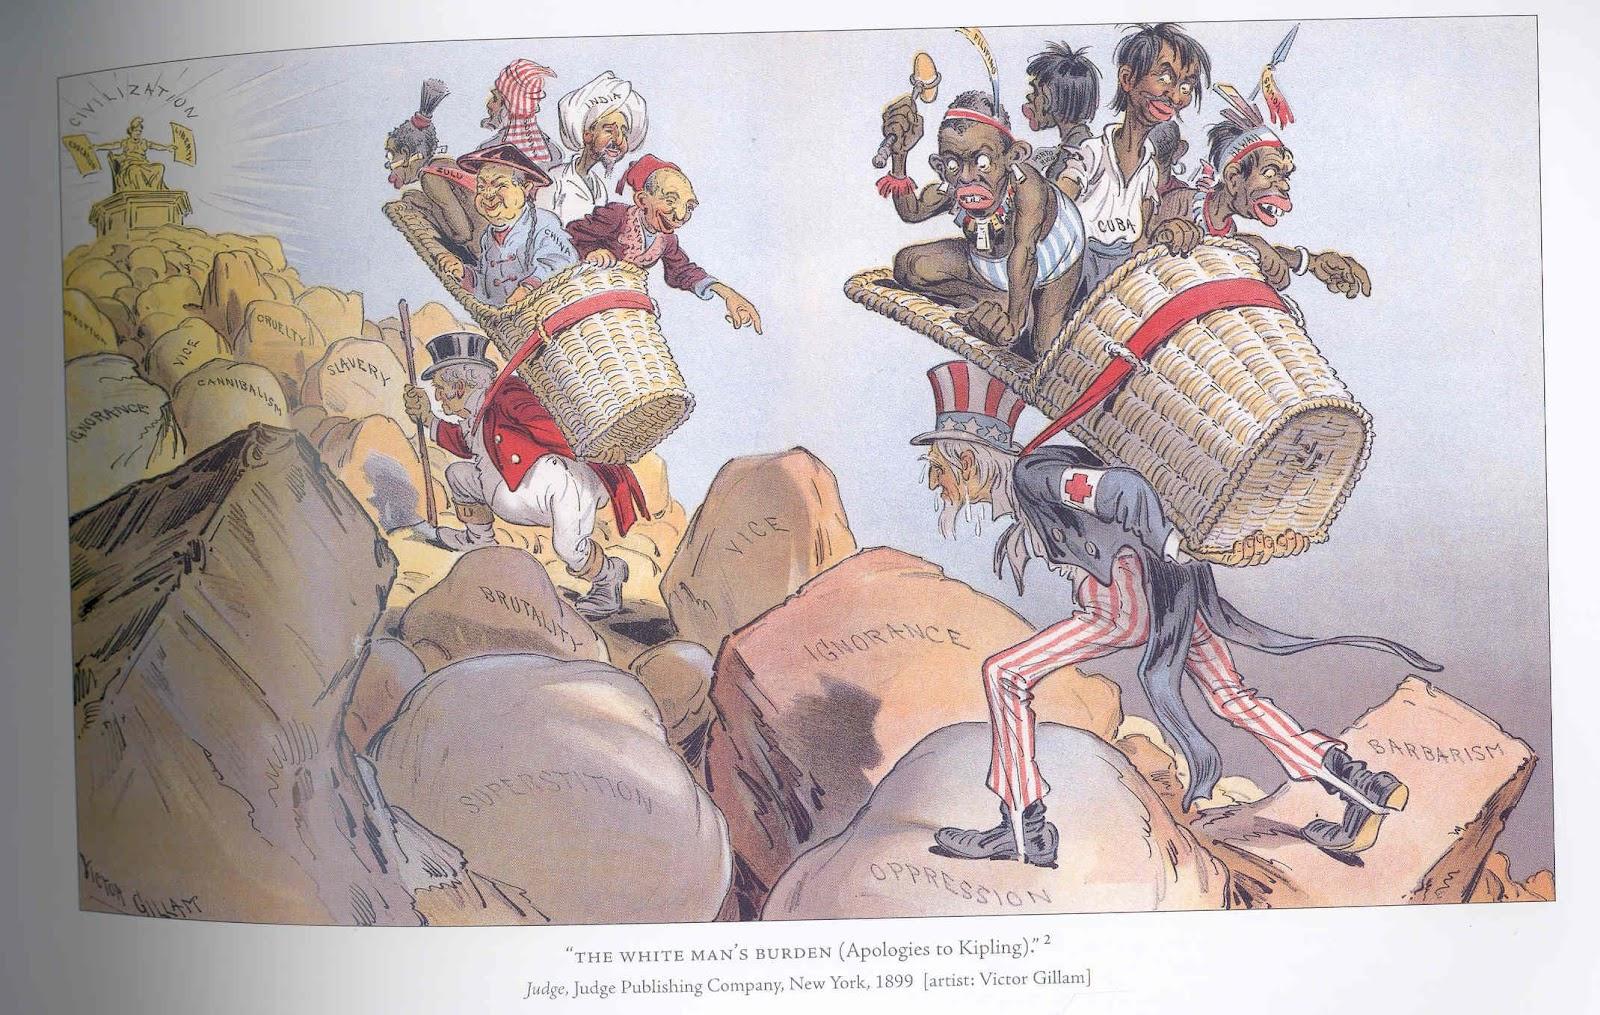 imperialism cartoon - photo #4